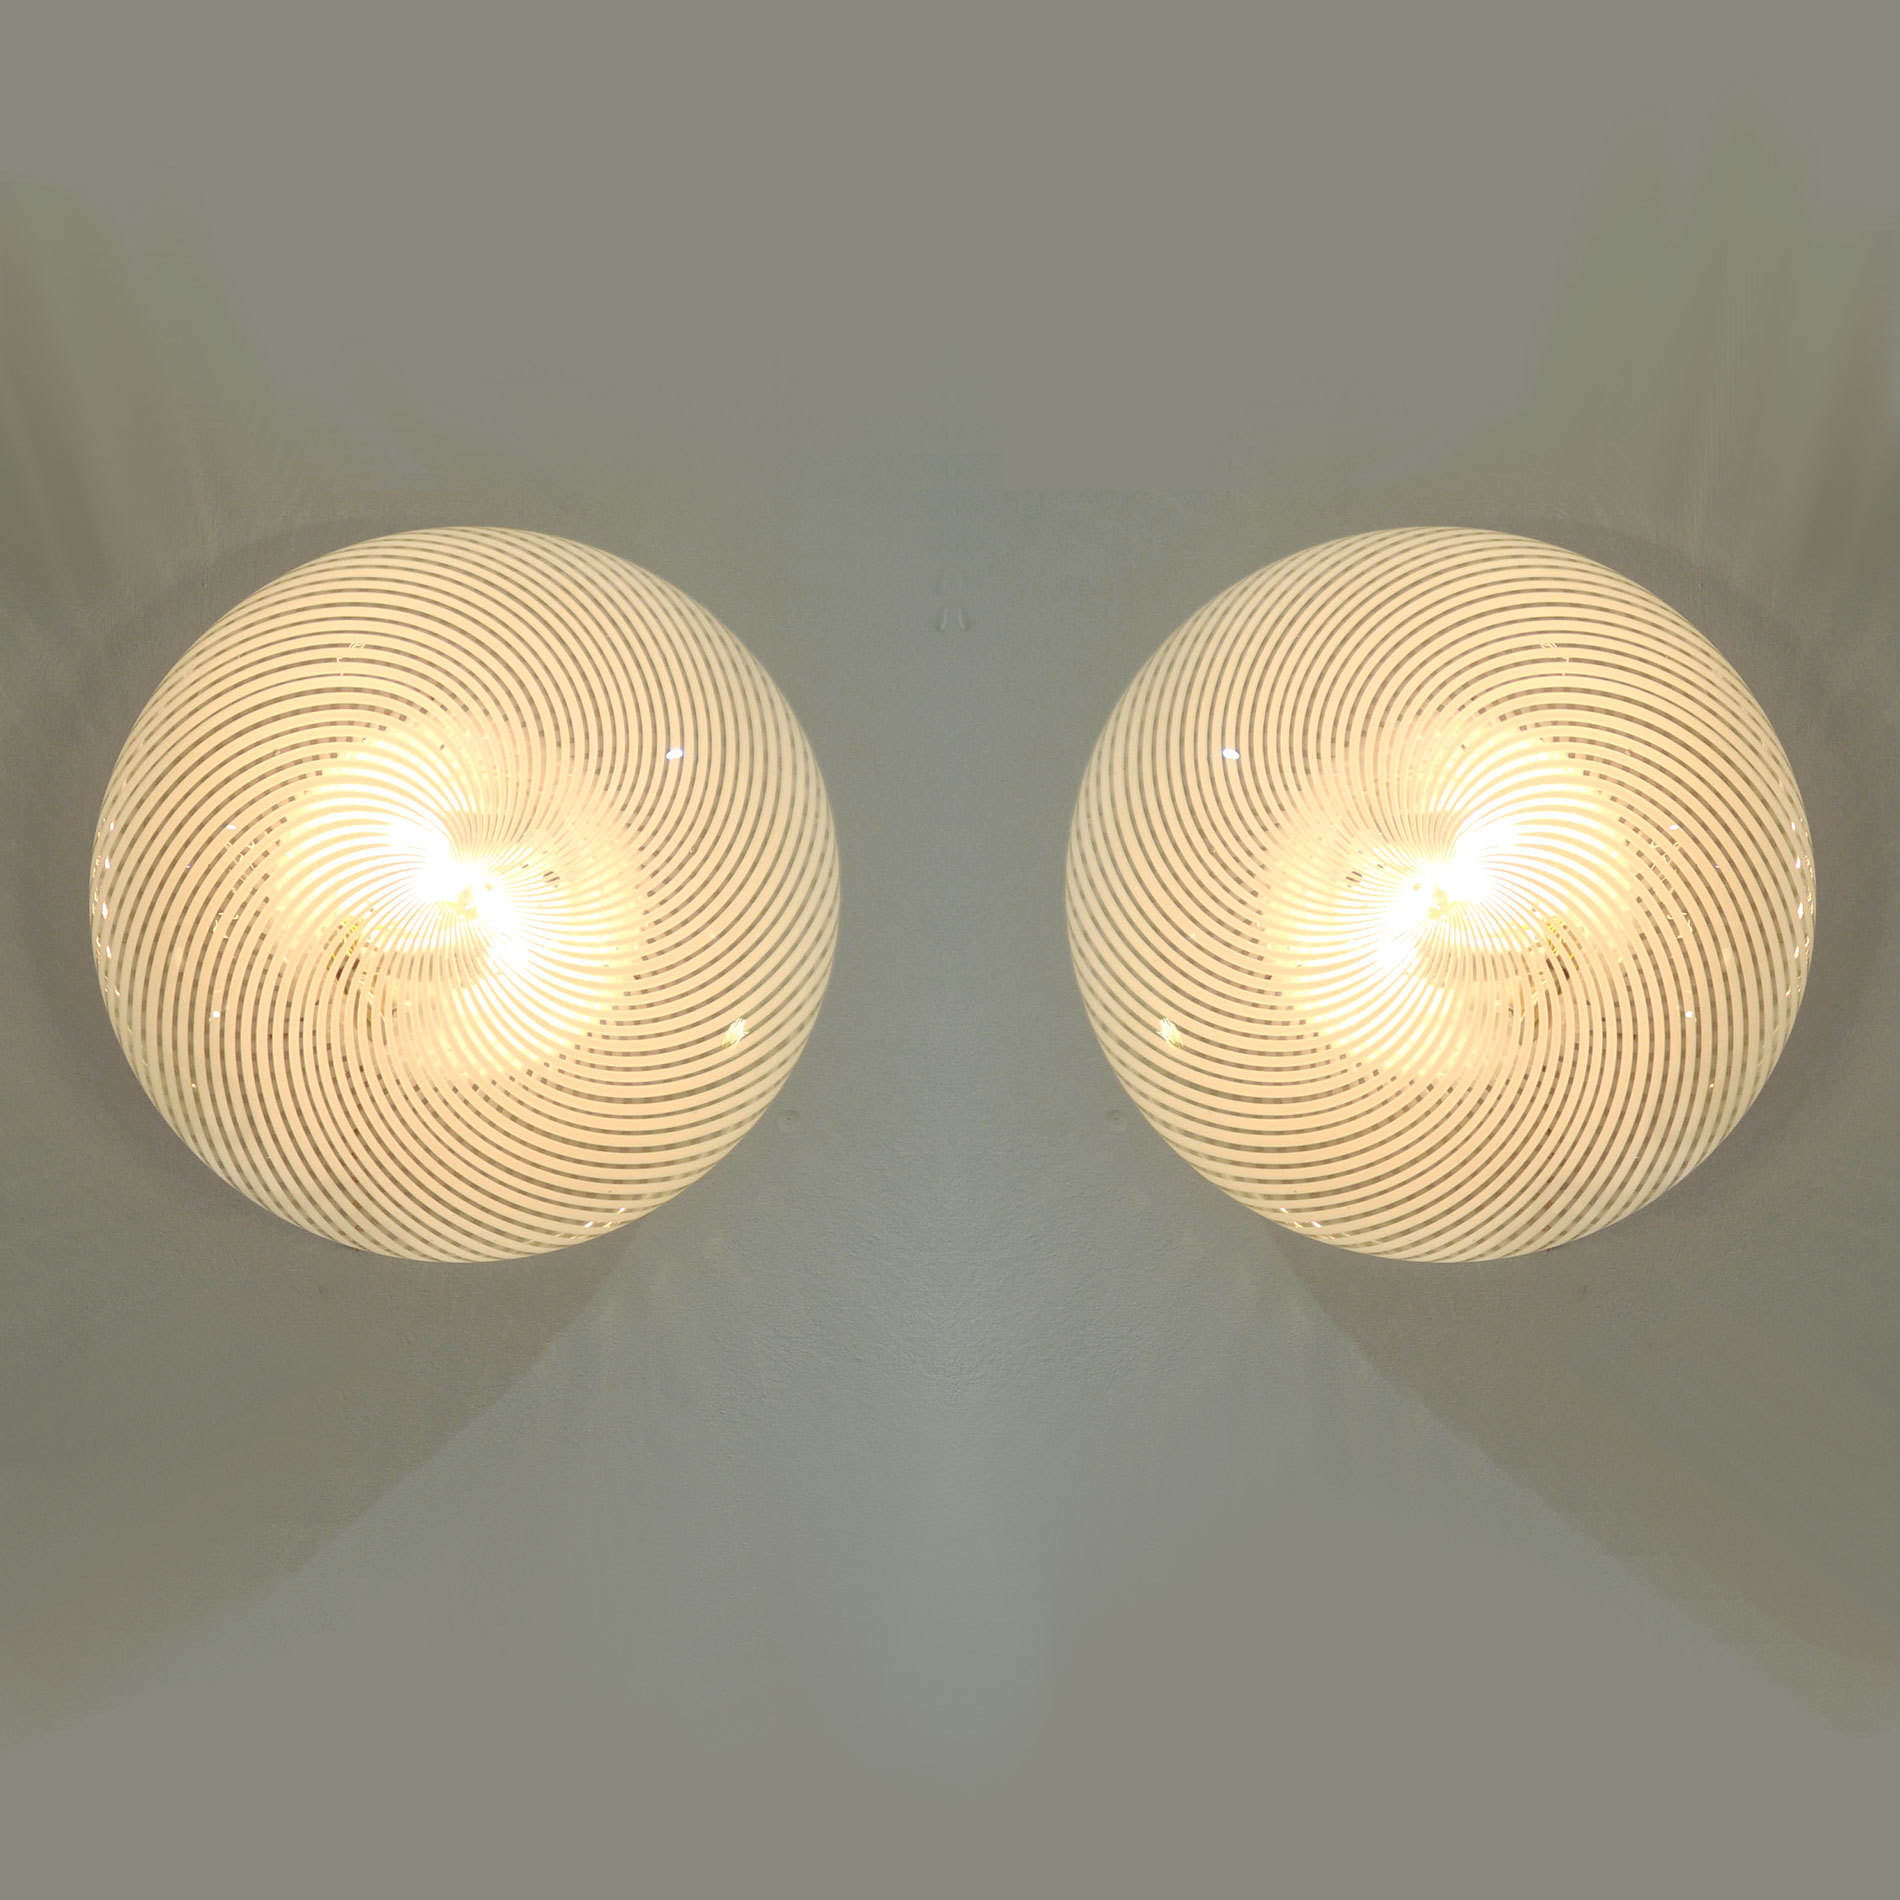 Pair Swirl Circular Wall Lights 01